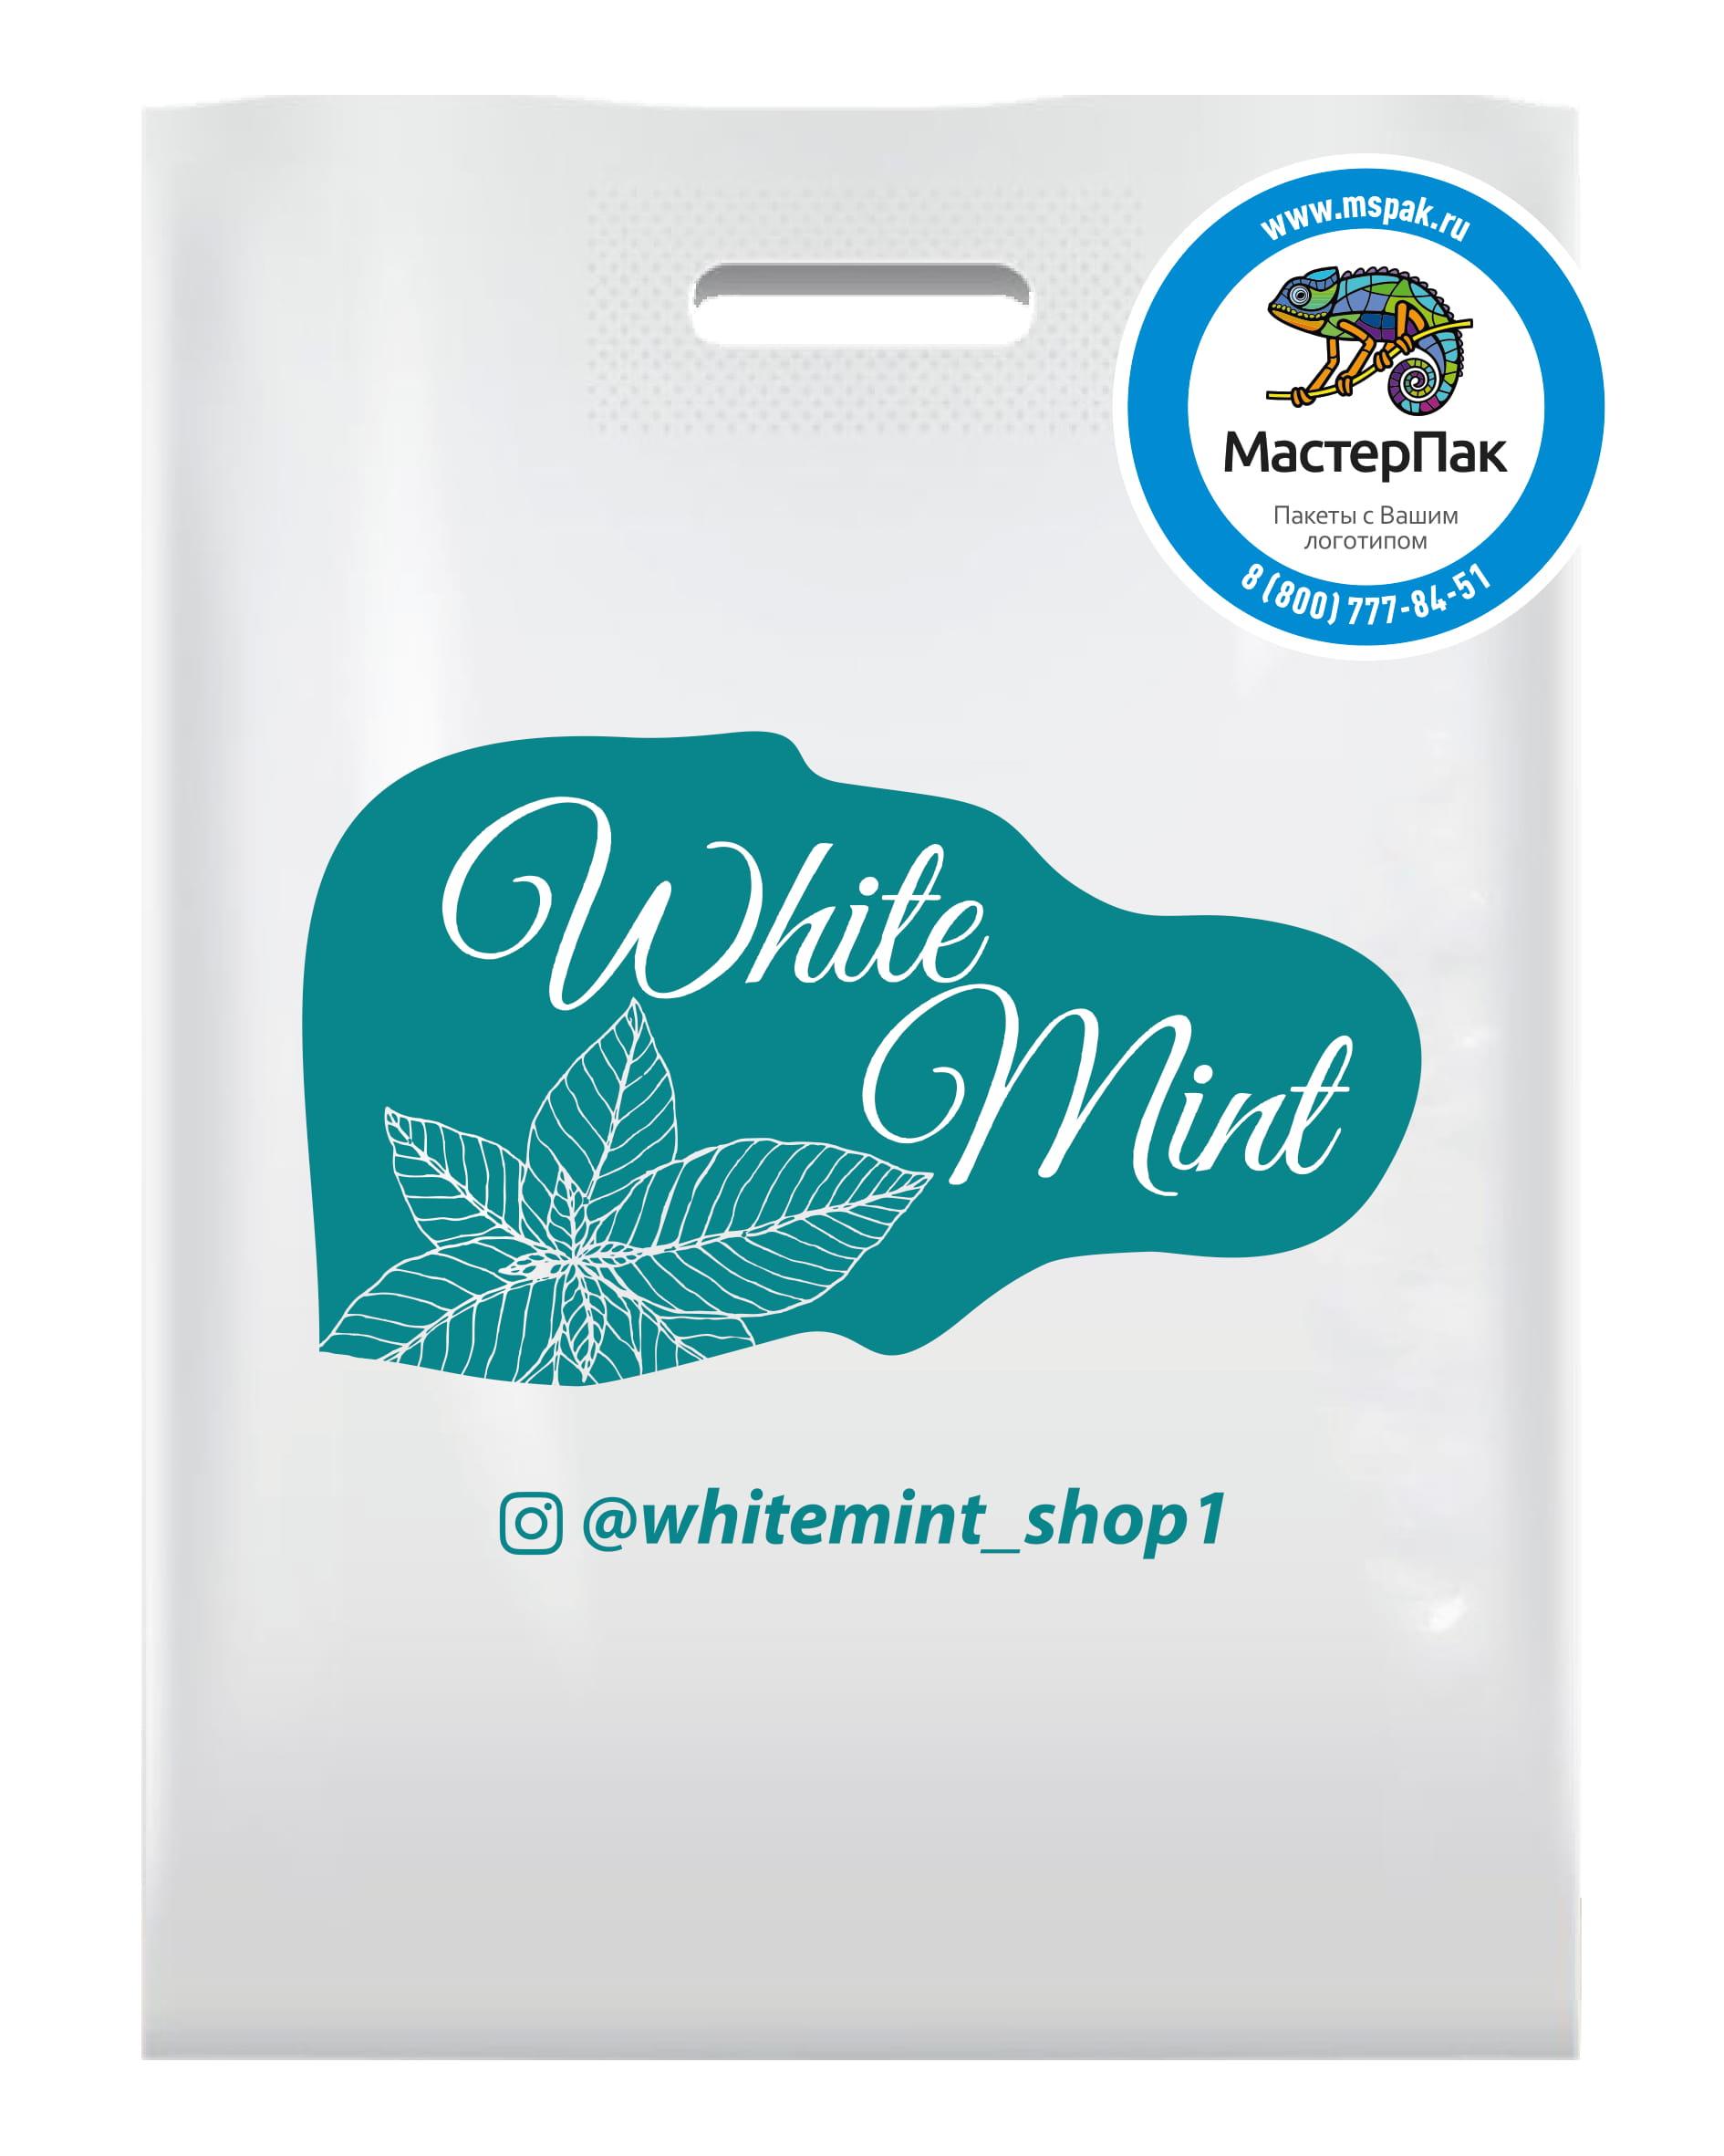 Пакет ПВД с логотипом White Мint, Калининград, 70 мкм, 30*40, белый